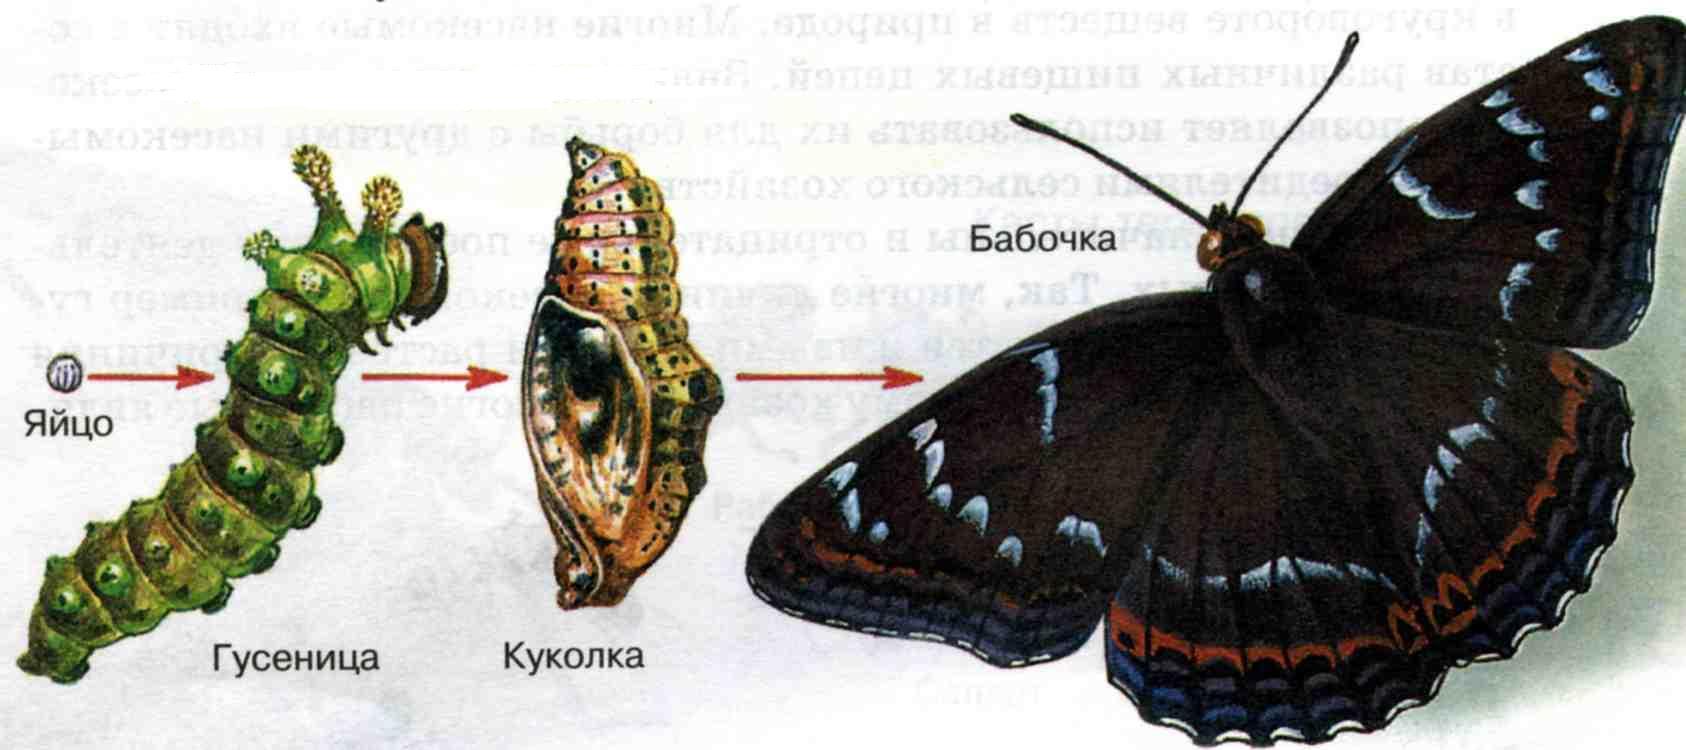 http://www.pics-zone.ru/img.php?url=http://900igr.net/datai/biologija/Embrionalnyj-period-razvitija/0016-026-Razvitie-zemnovodnogo.jpg